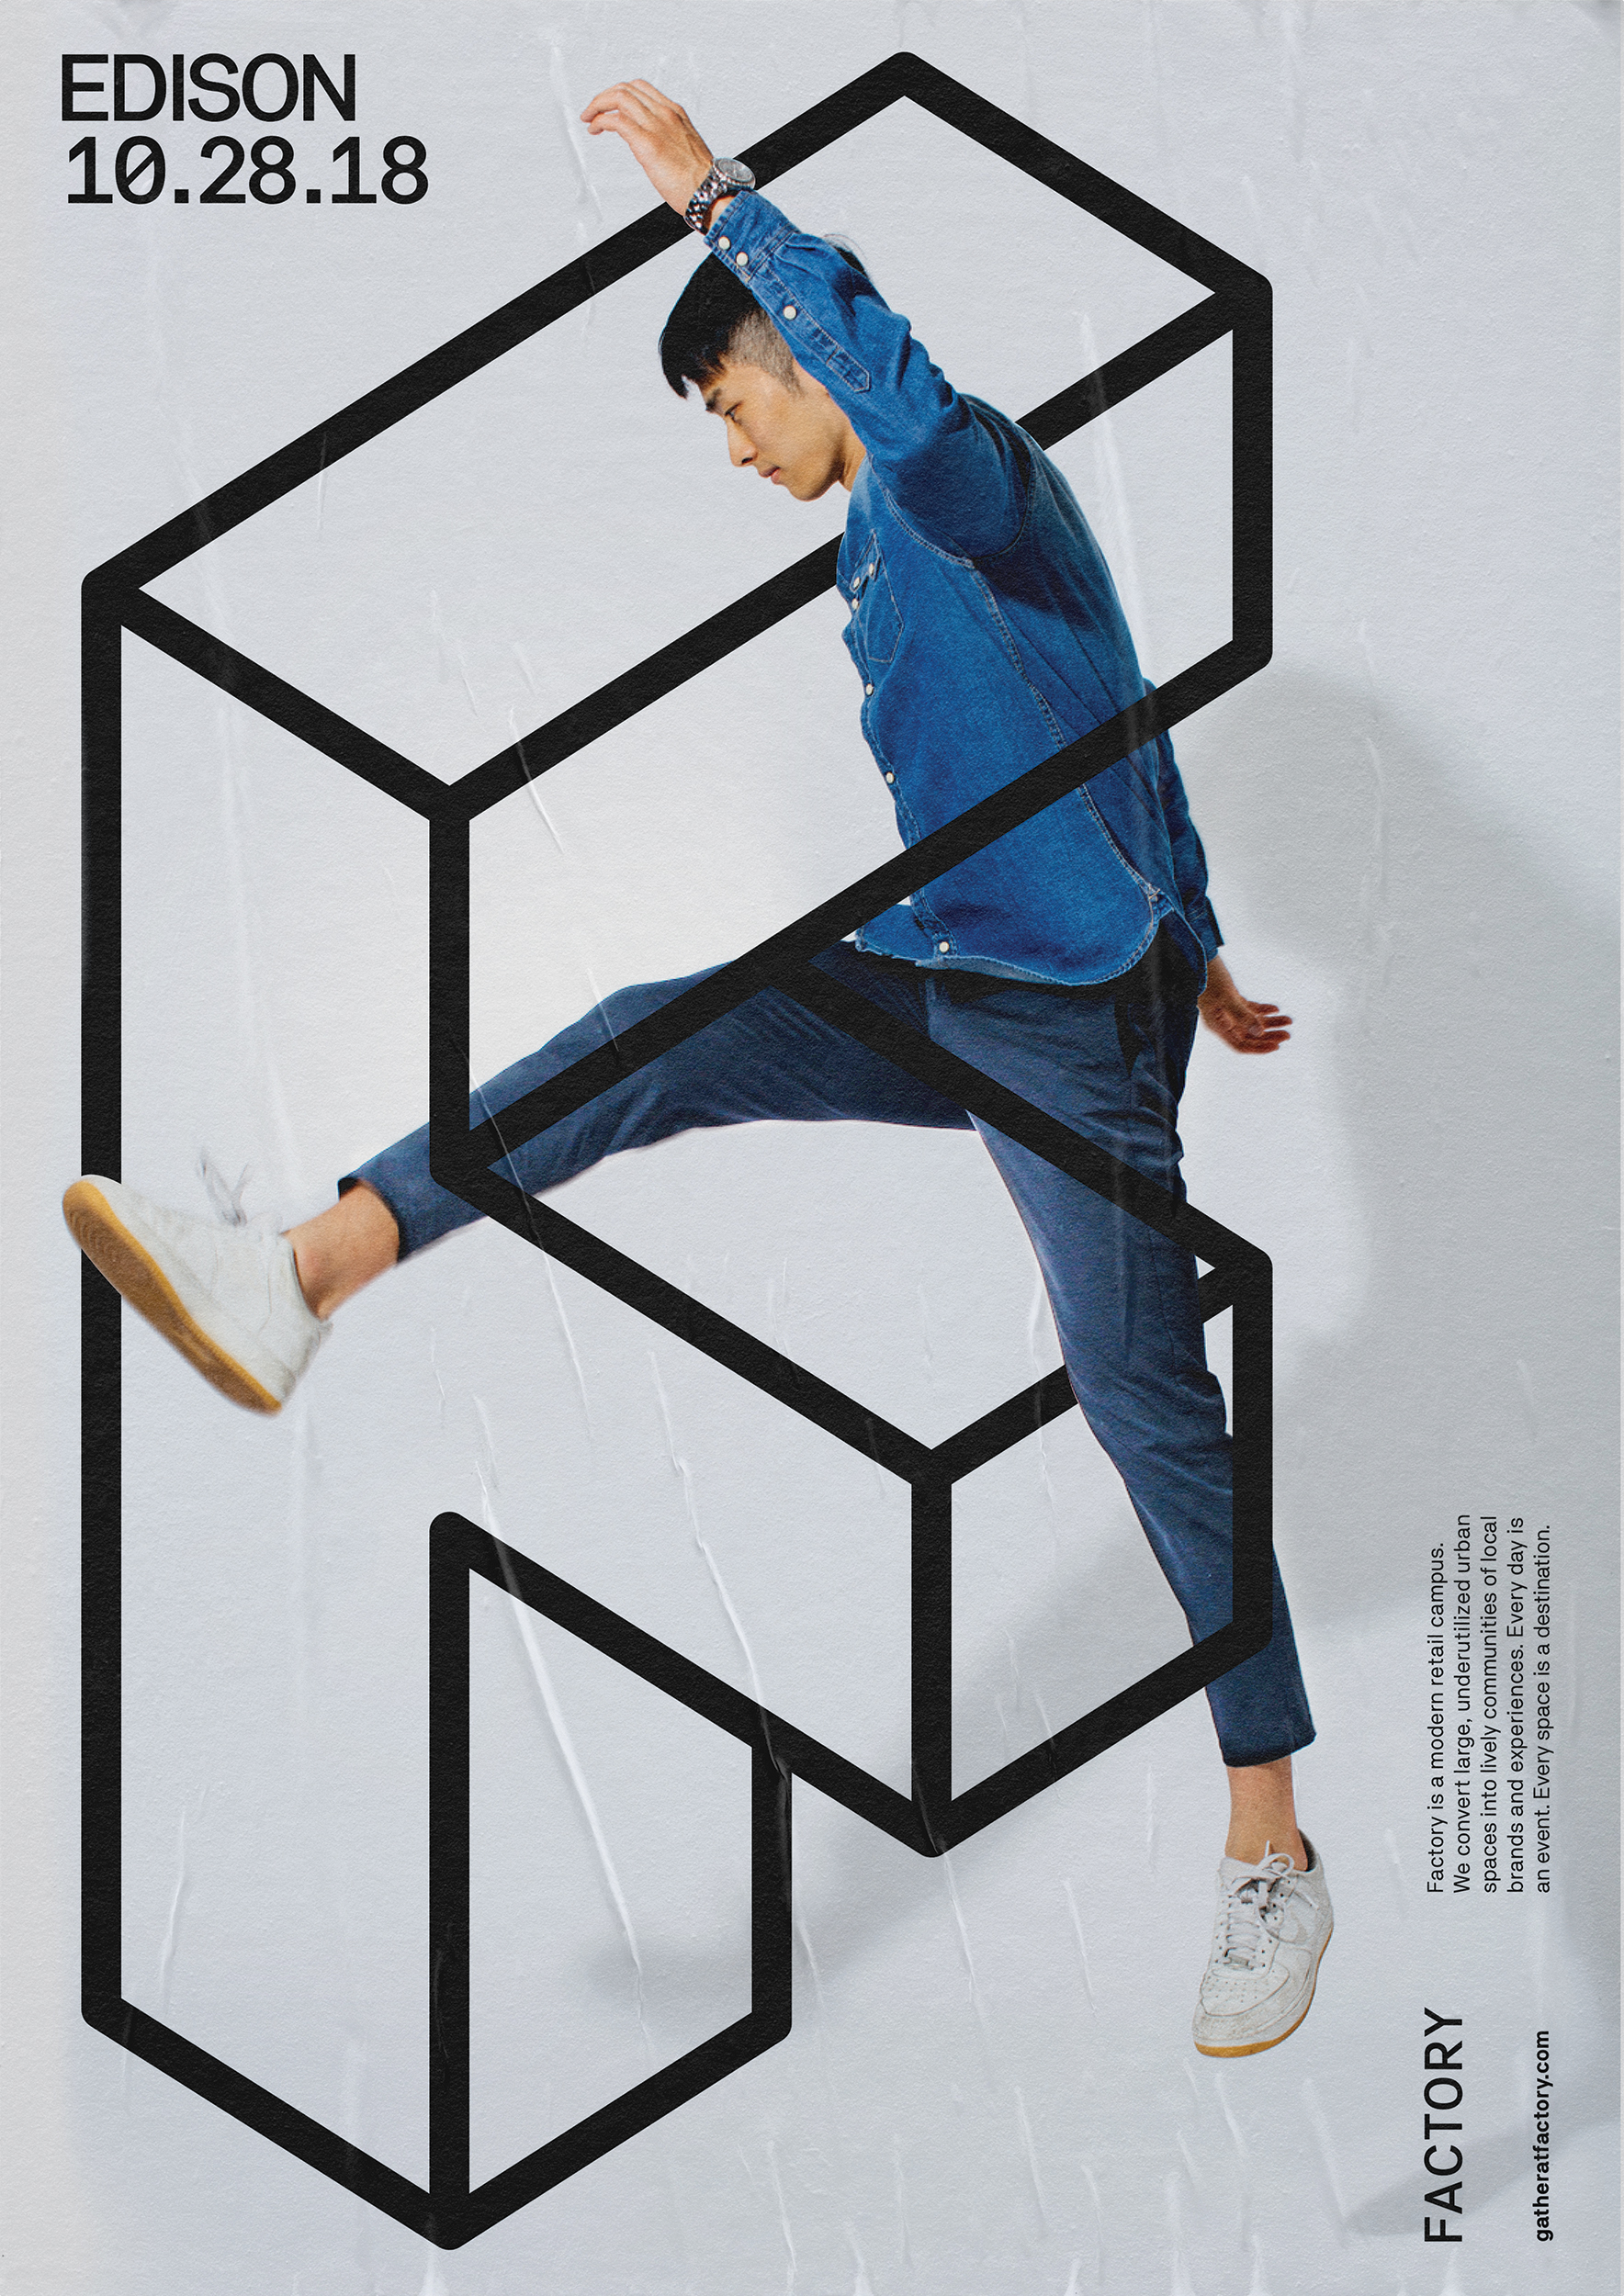 JK_Factory_Poster_2.jpg